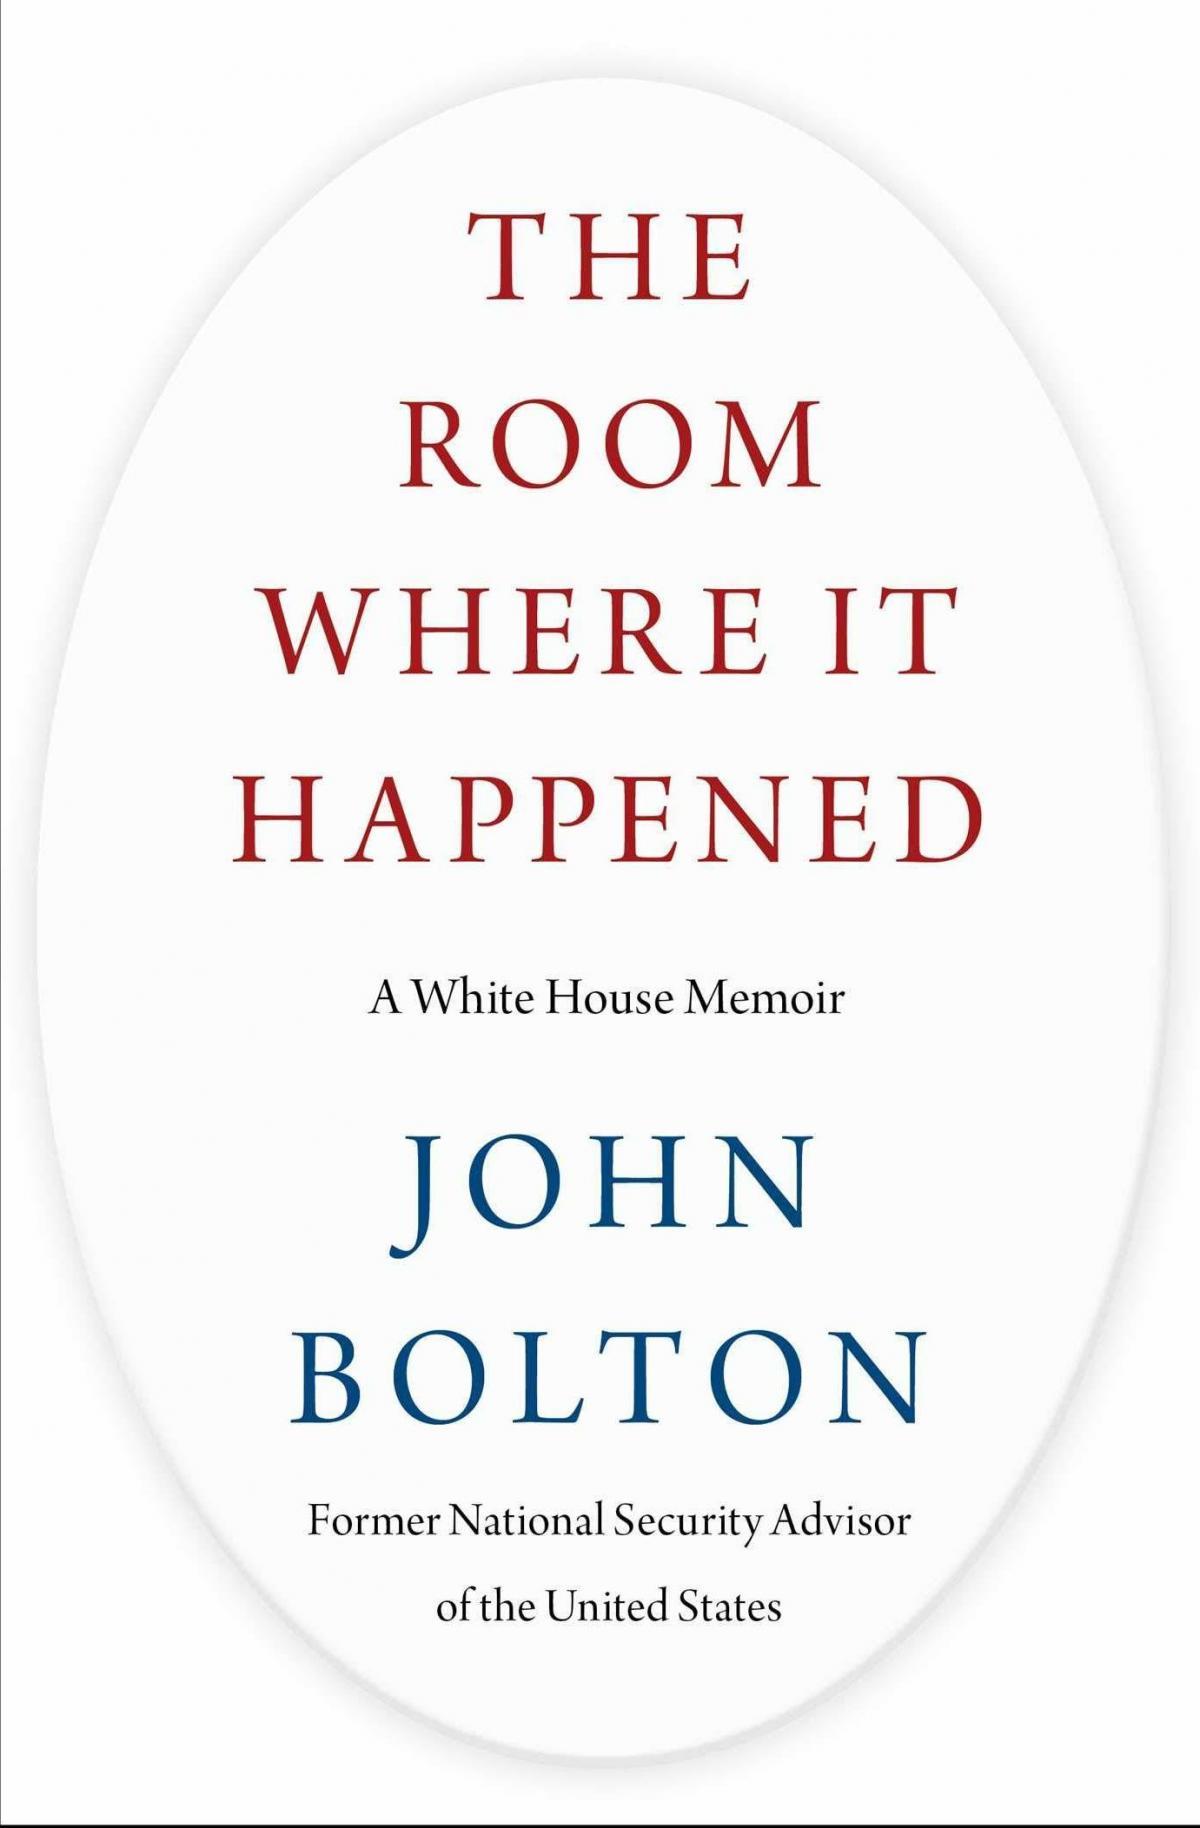 John Bolton's The Room Where It Happened: A White House Memoir is set to publish June 23.